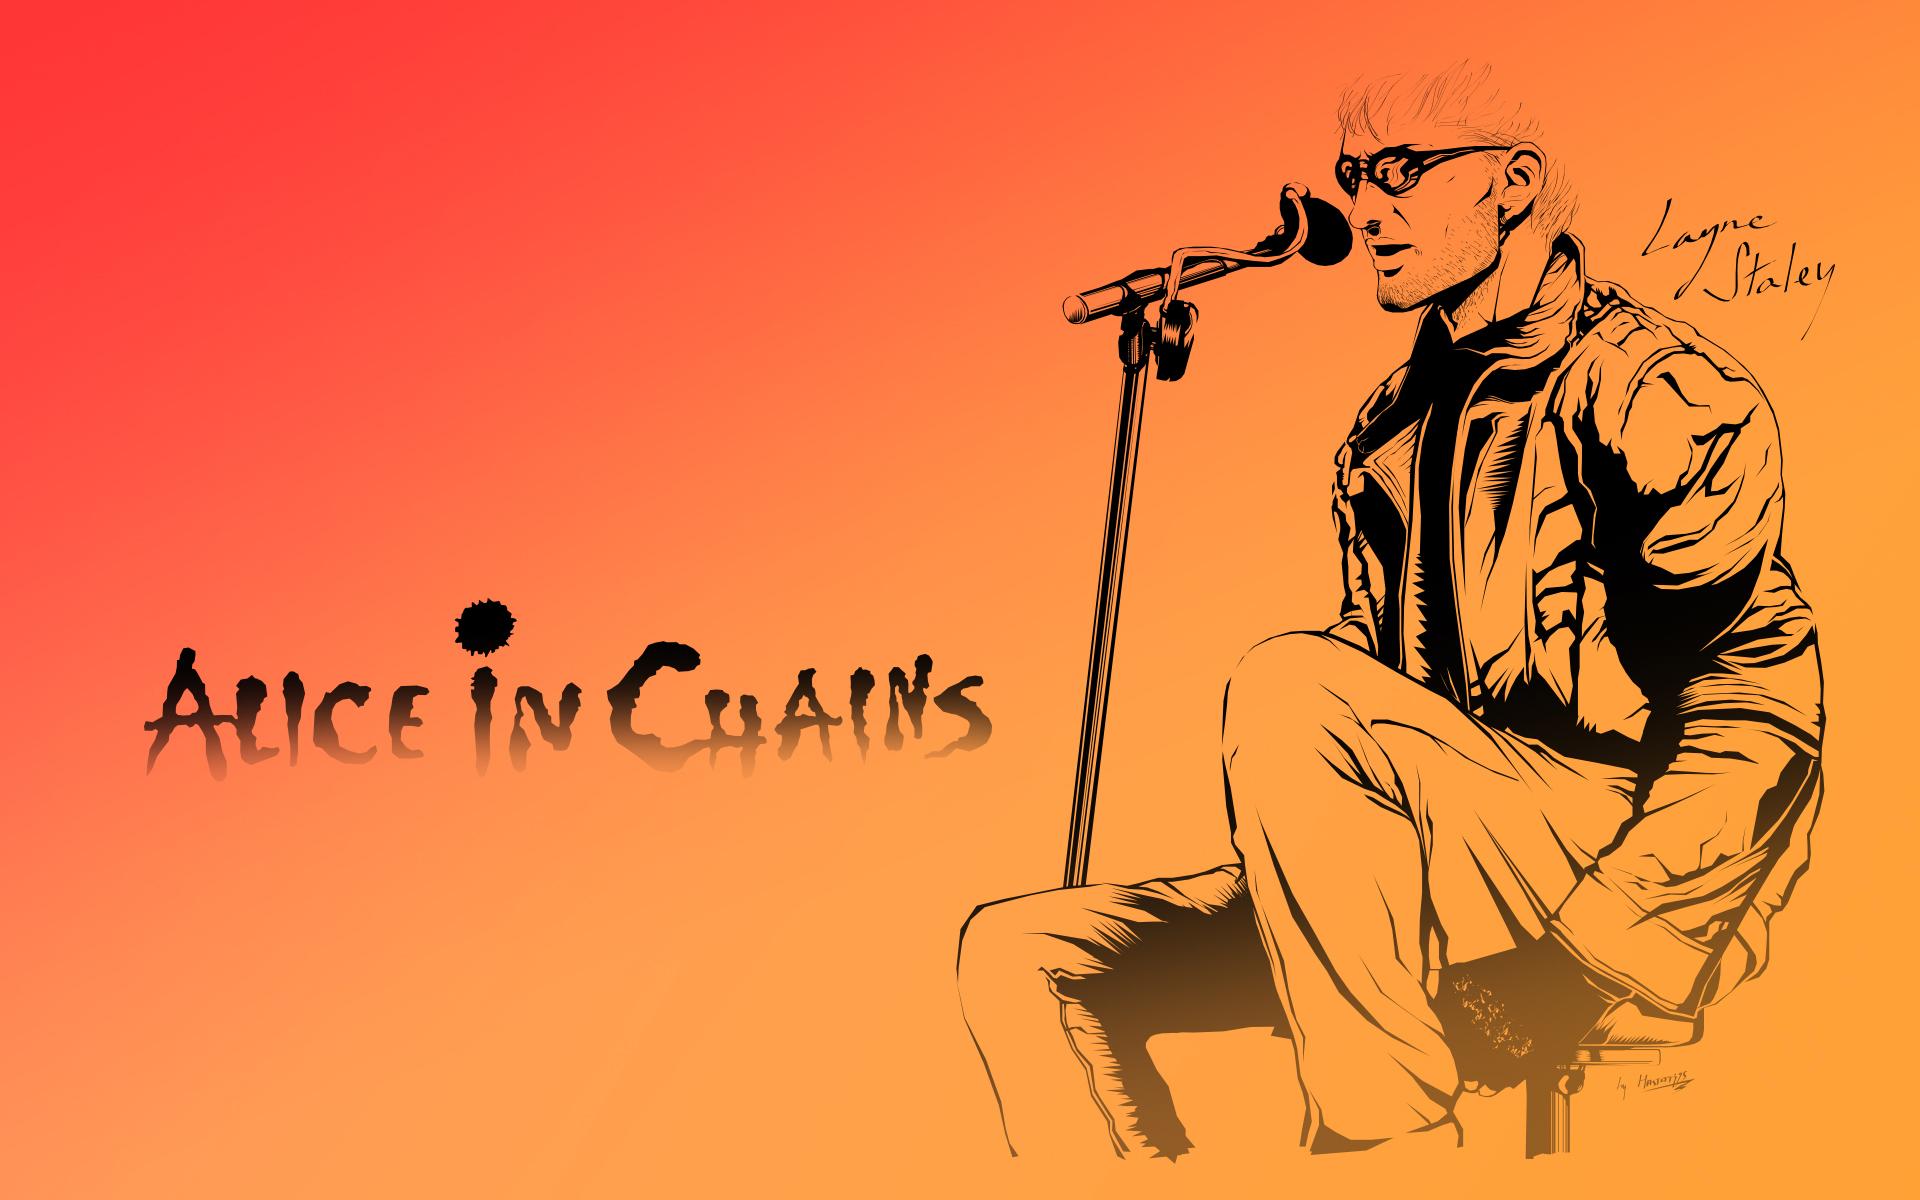 Alice In Chains Wallpaper by hastati95 on DeviantArt